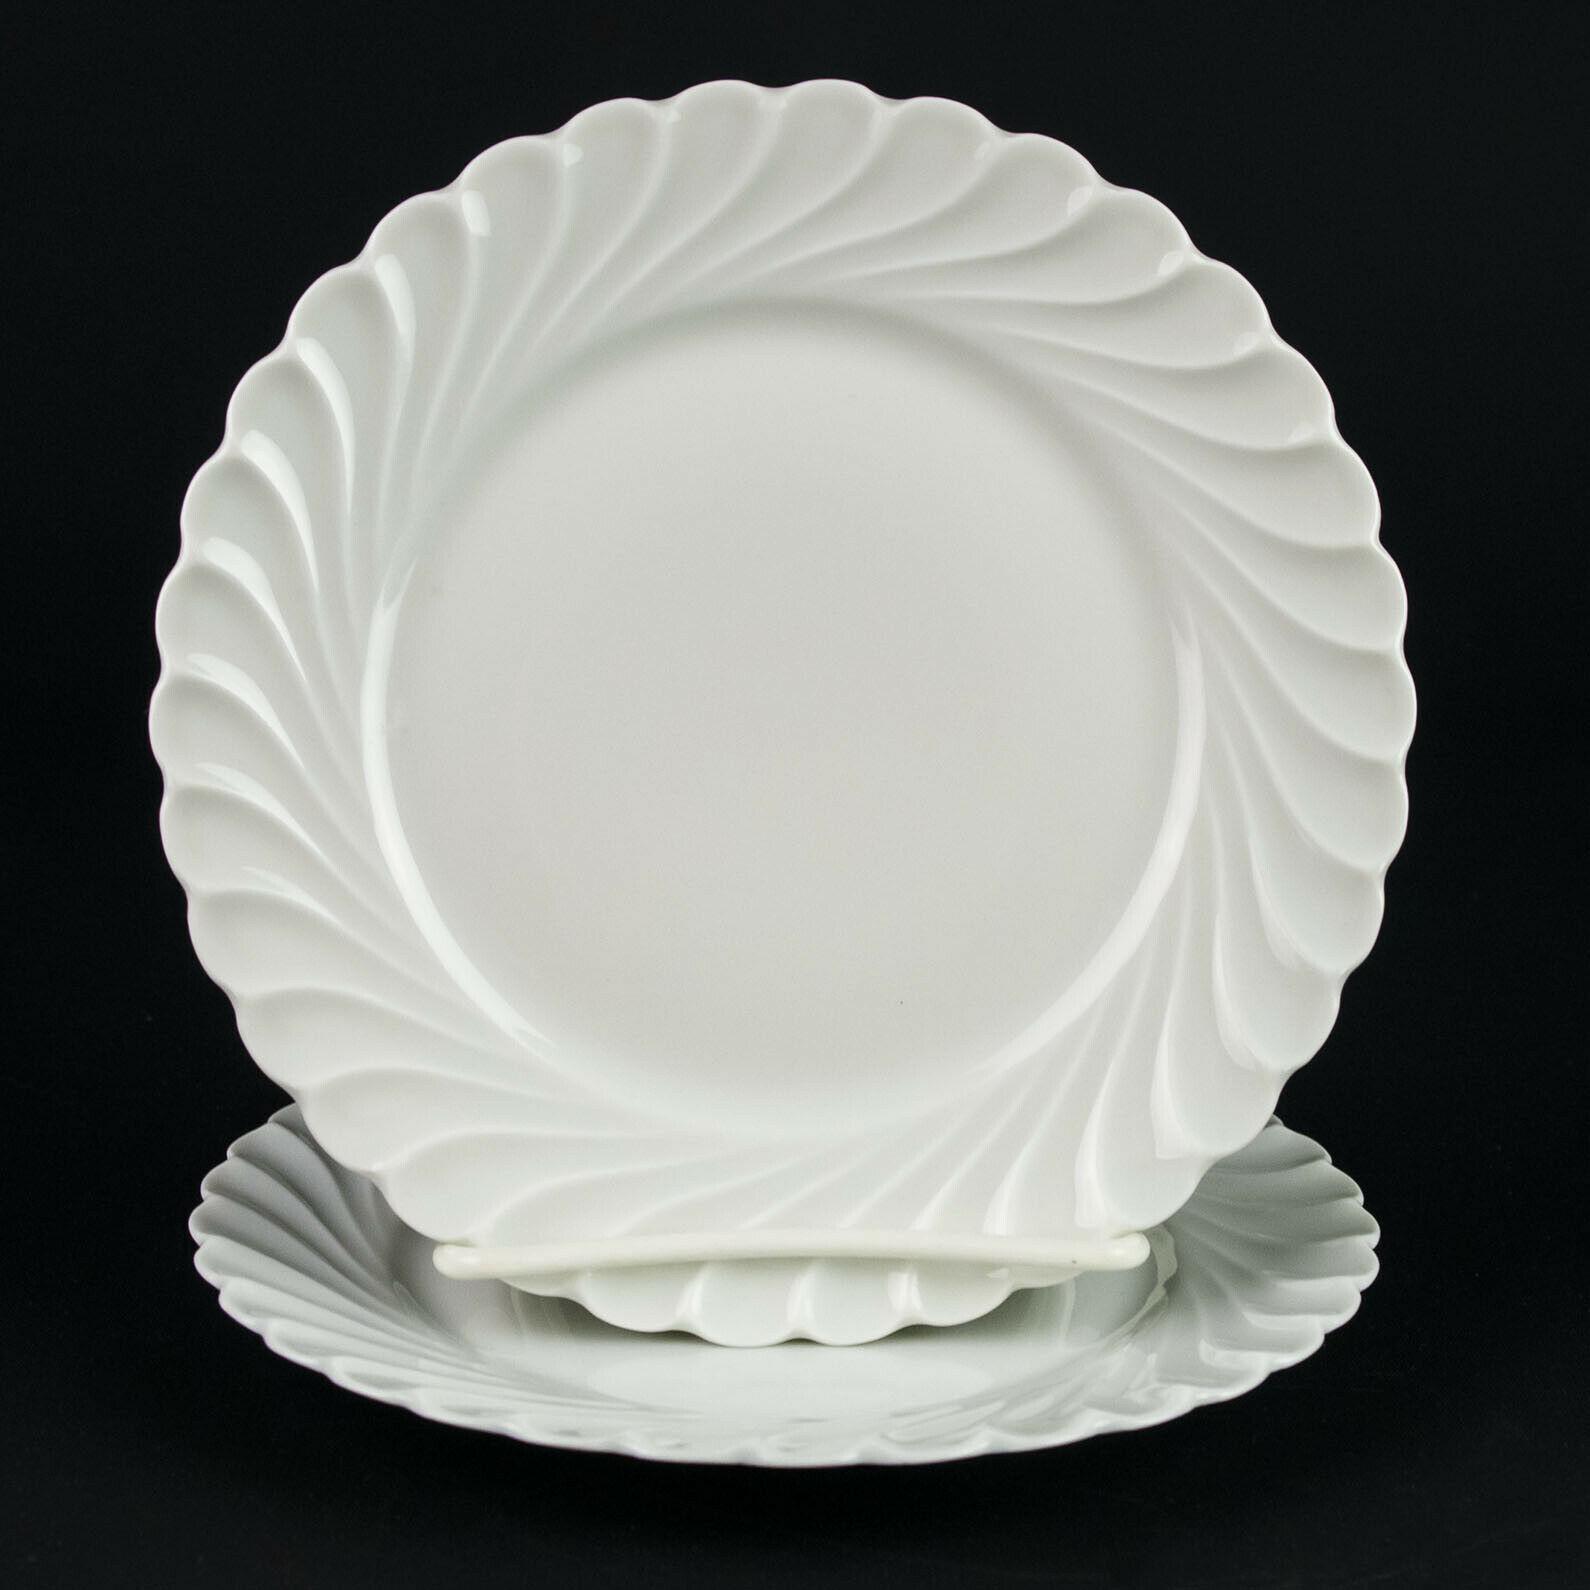 "Haviland Limoges Torse Bread Plates 2 pc Set, Vintage All White Swirl 6 3/8"" - $14.70"